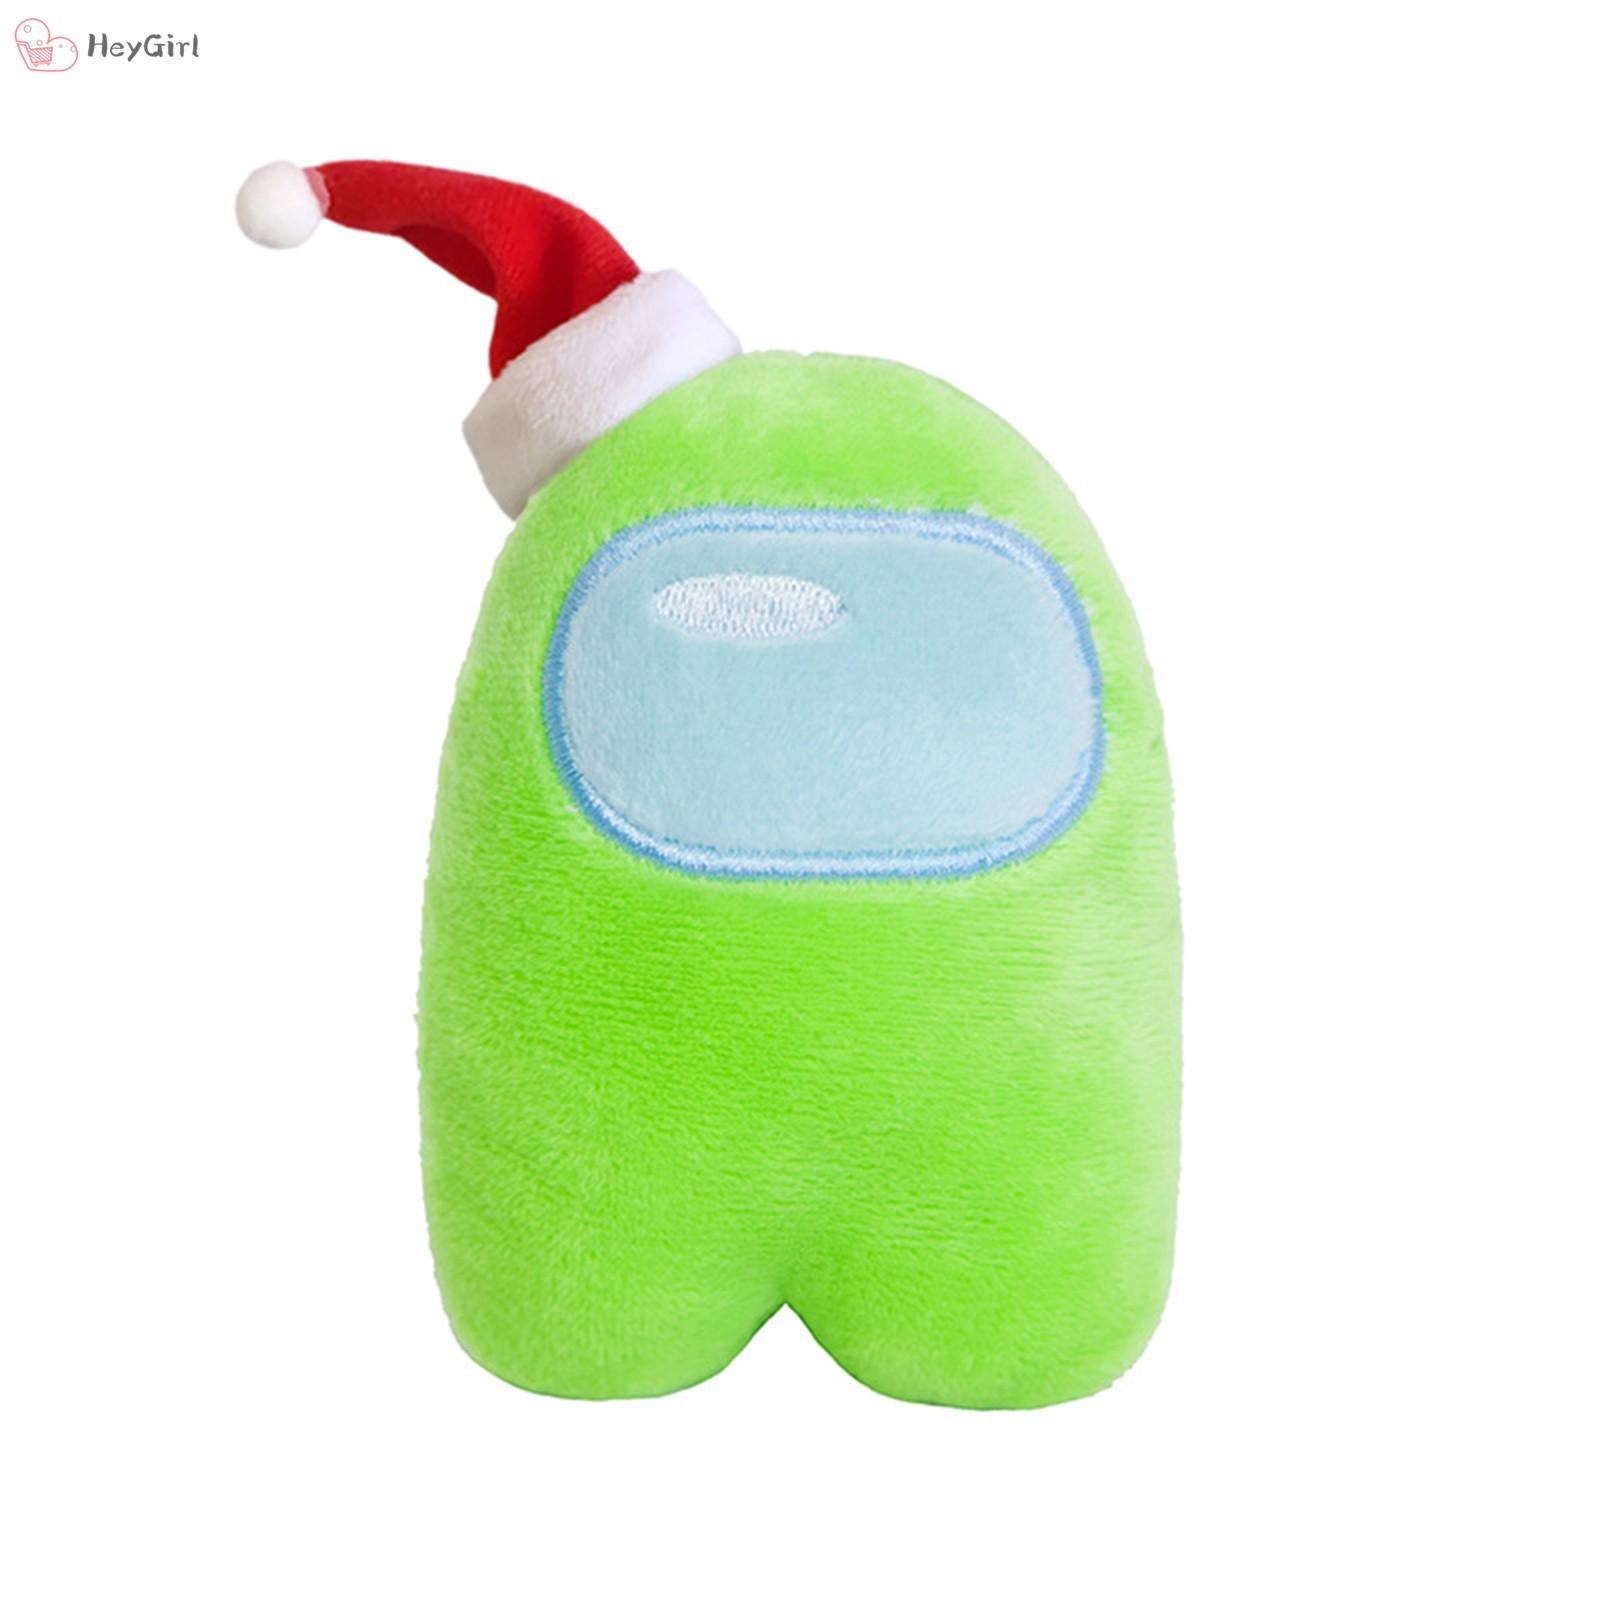 Xmas Hat Figure Among Us Plush Crewmate Plushie Kawaii Stuffed Soft Game Plush Toy Lovely Stuffed Doll Christmas Gift